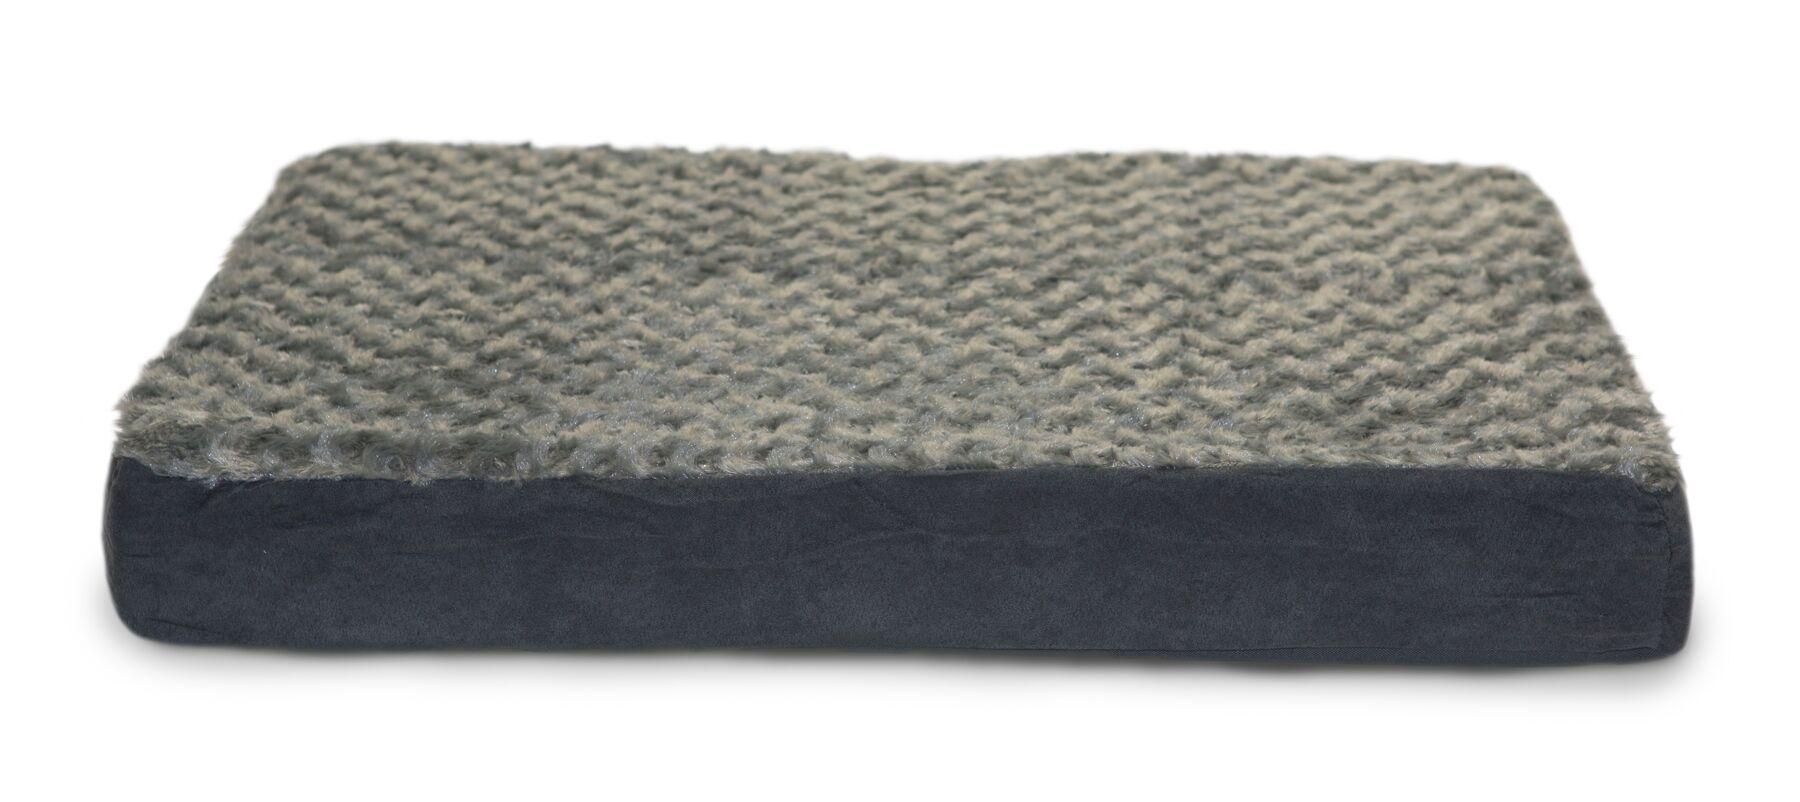 Boris Ultra Plush Cooling Gel Foam Pet Bed Color: Gray, Size: Medium